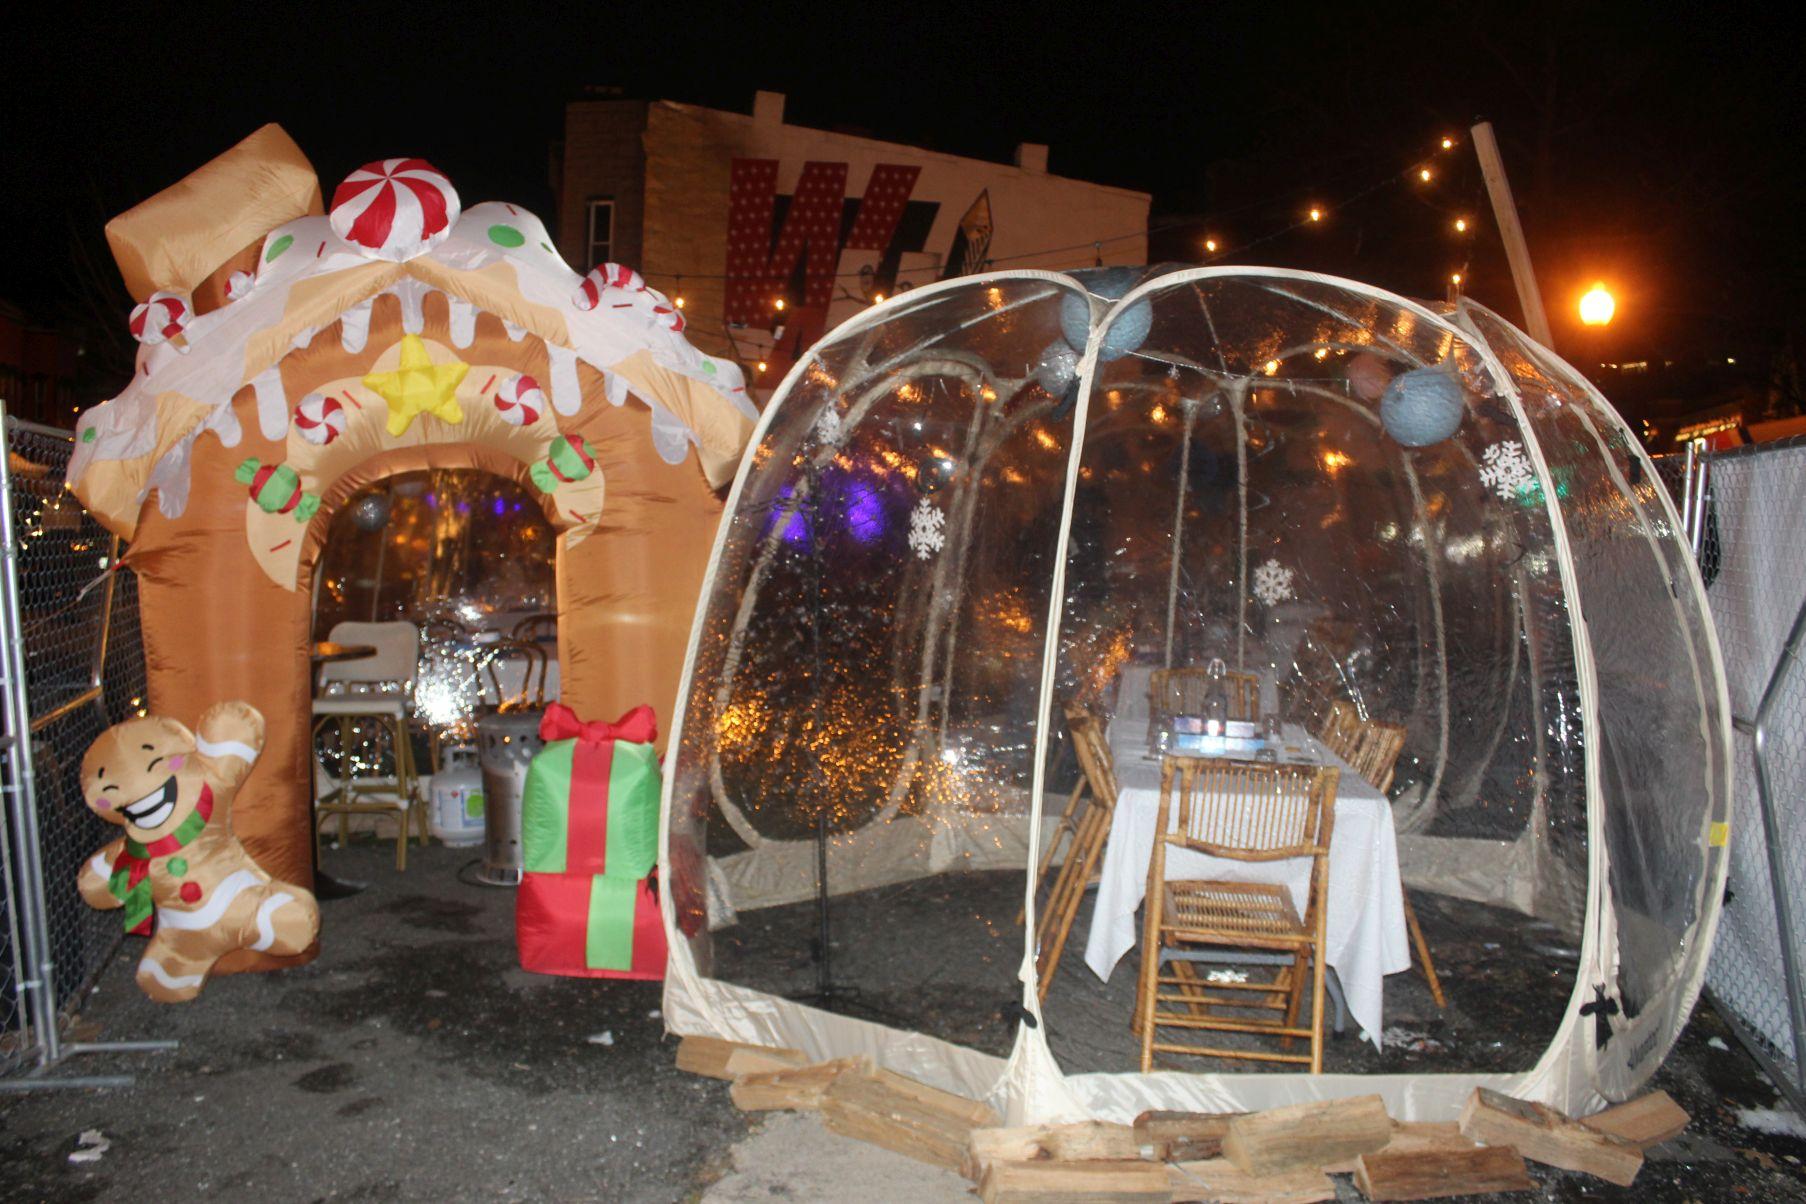 An inflatable gingerbread house beside an igloo at the enterance to HalfSmoke's Winter Wonderland pop-up. (Photo: Mark Heckathorn/DC on Heels)